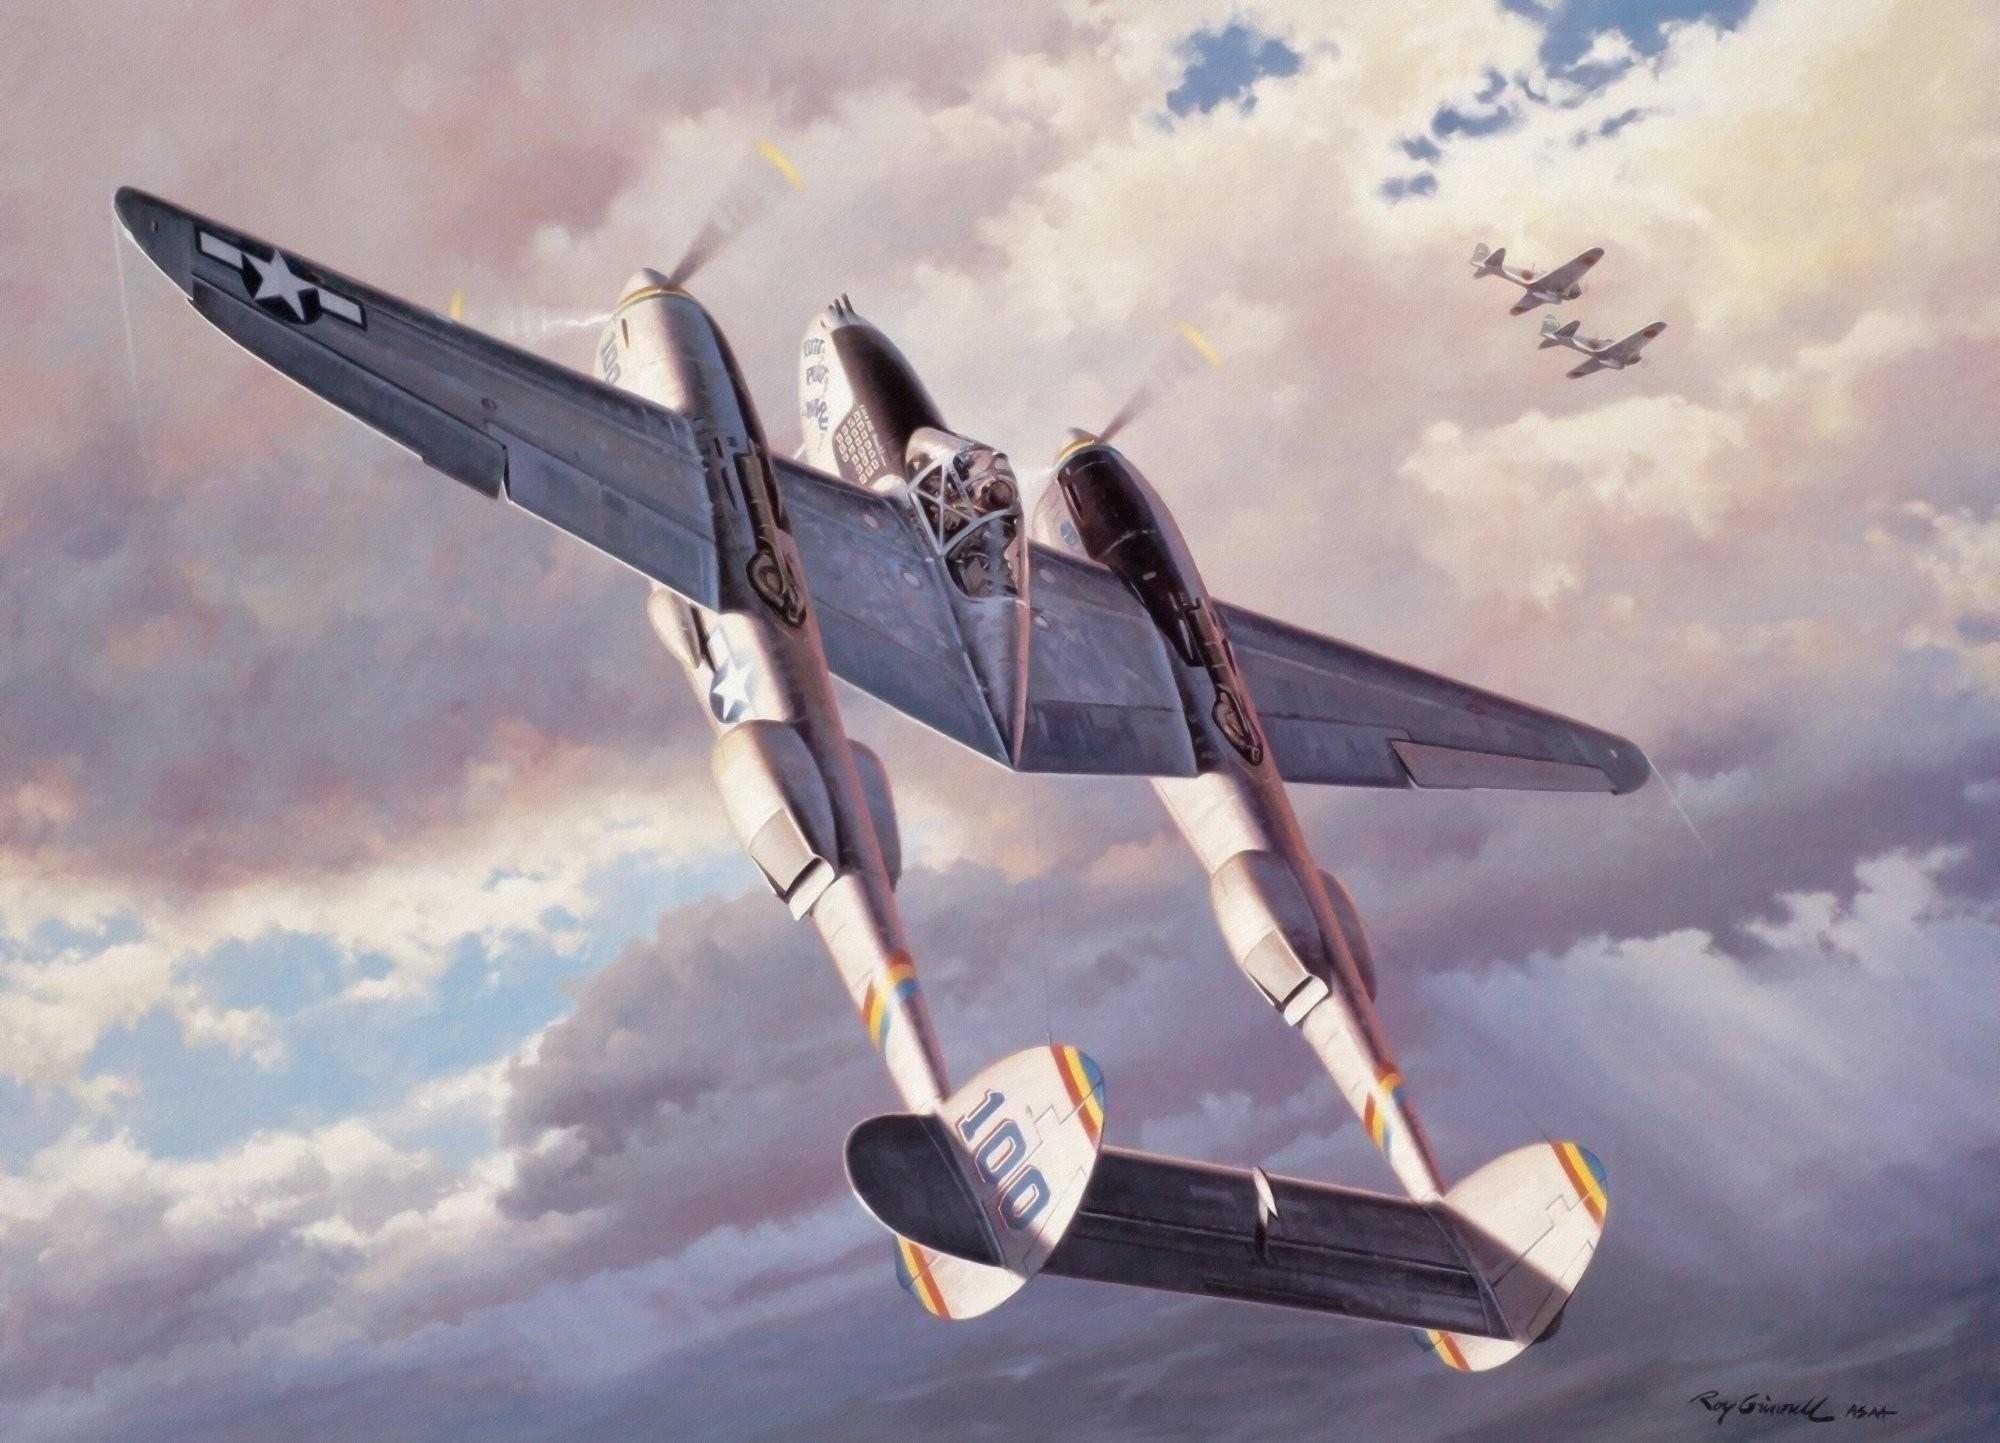 ww2 war art aviation fighter airplane painting p38 lightning wallpaper .